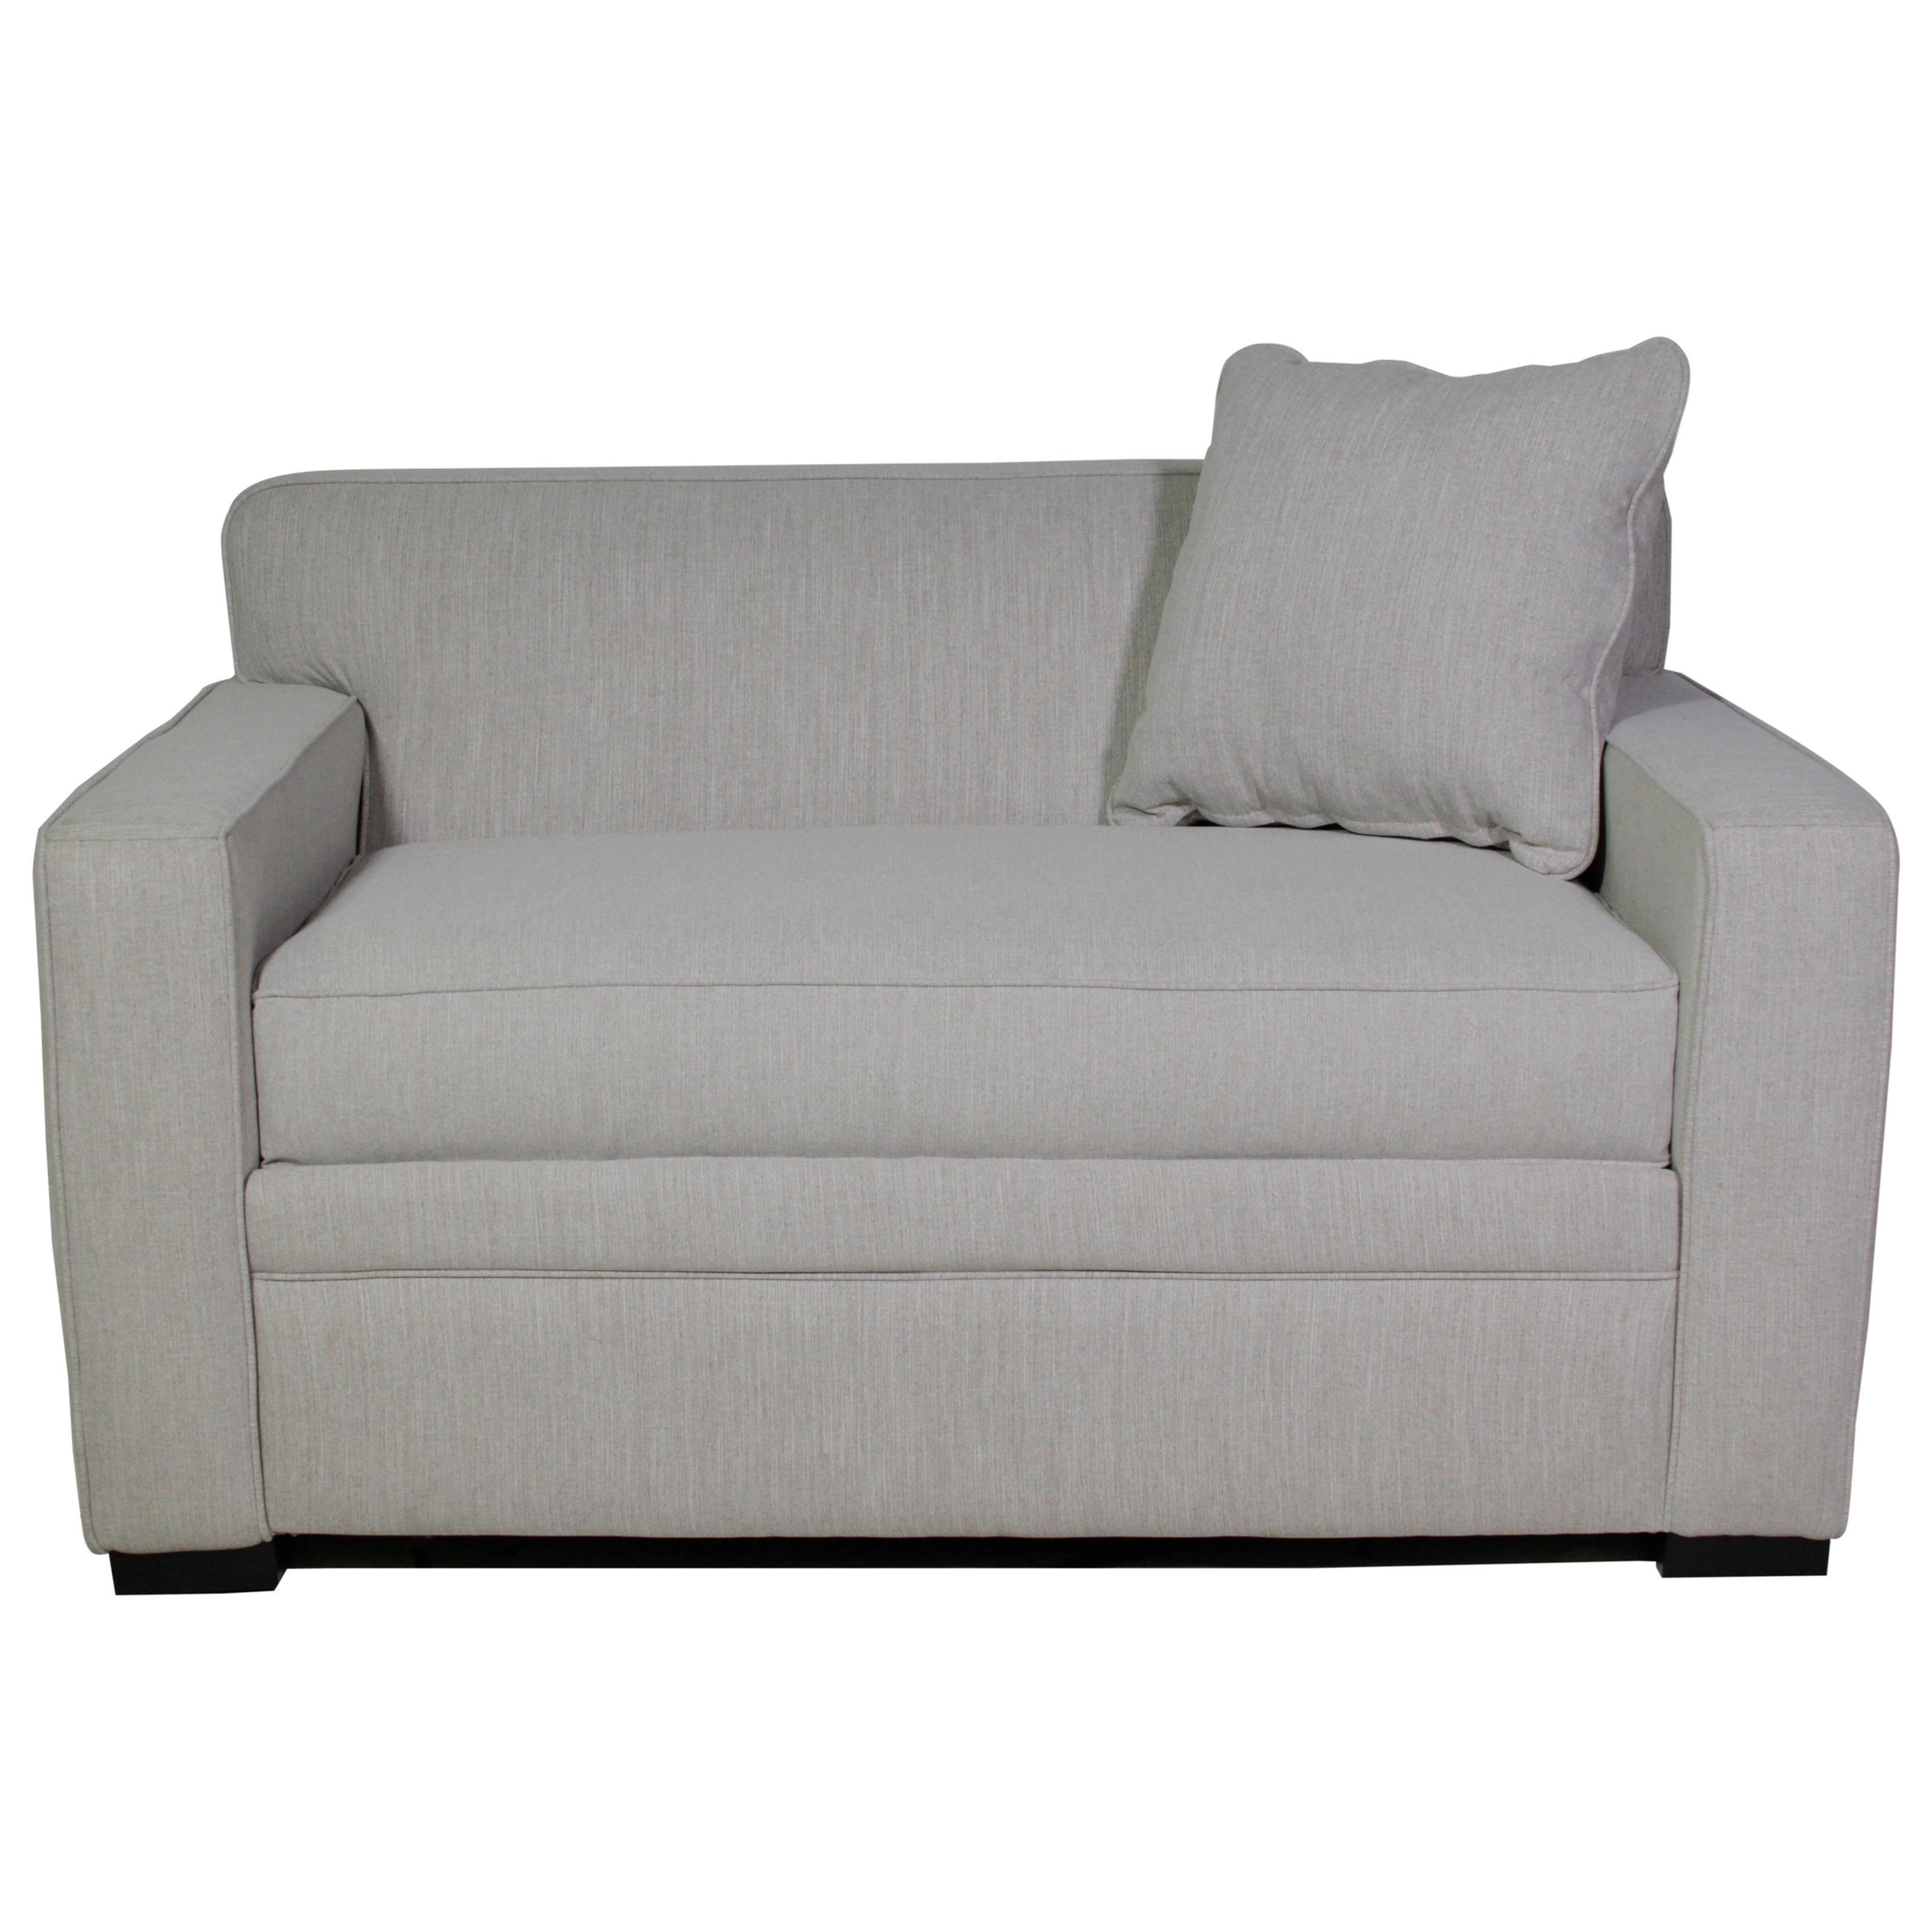 Sleepy Twin Pillow Top Sleeper Chair by Jonathan Louis at Fashion Furniture